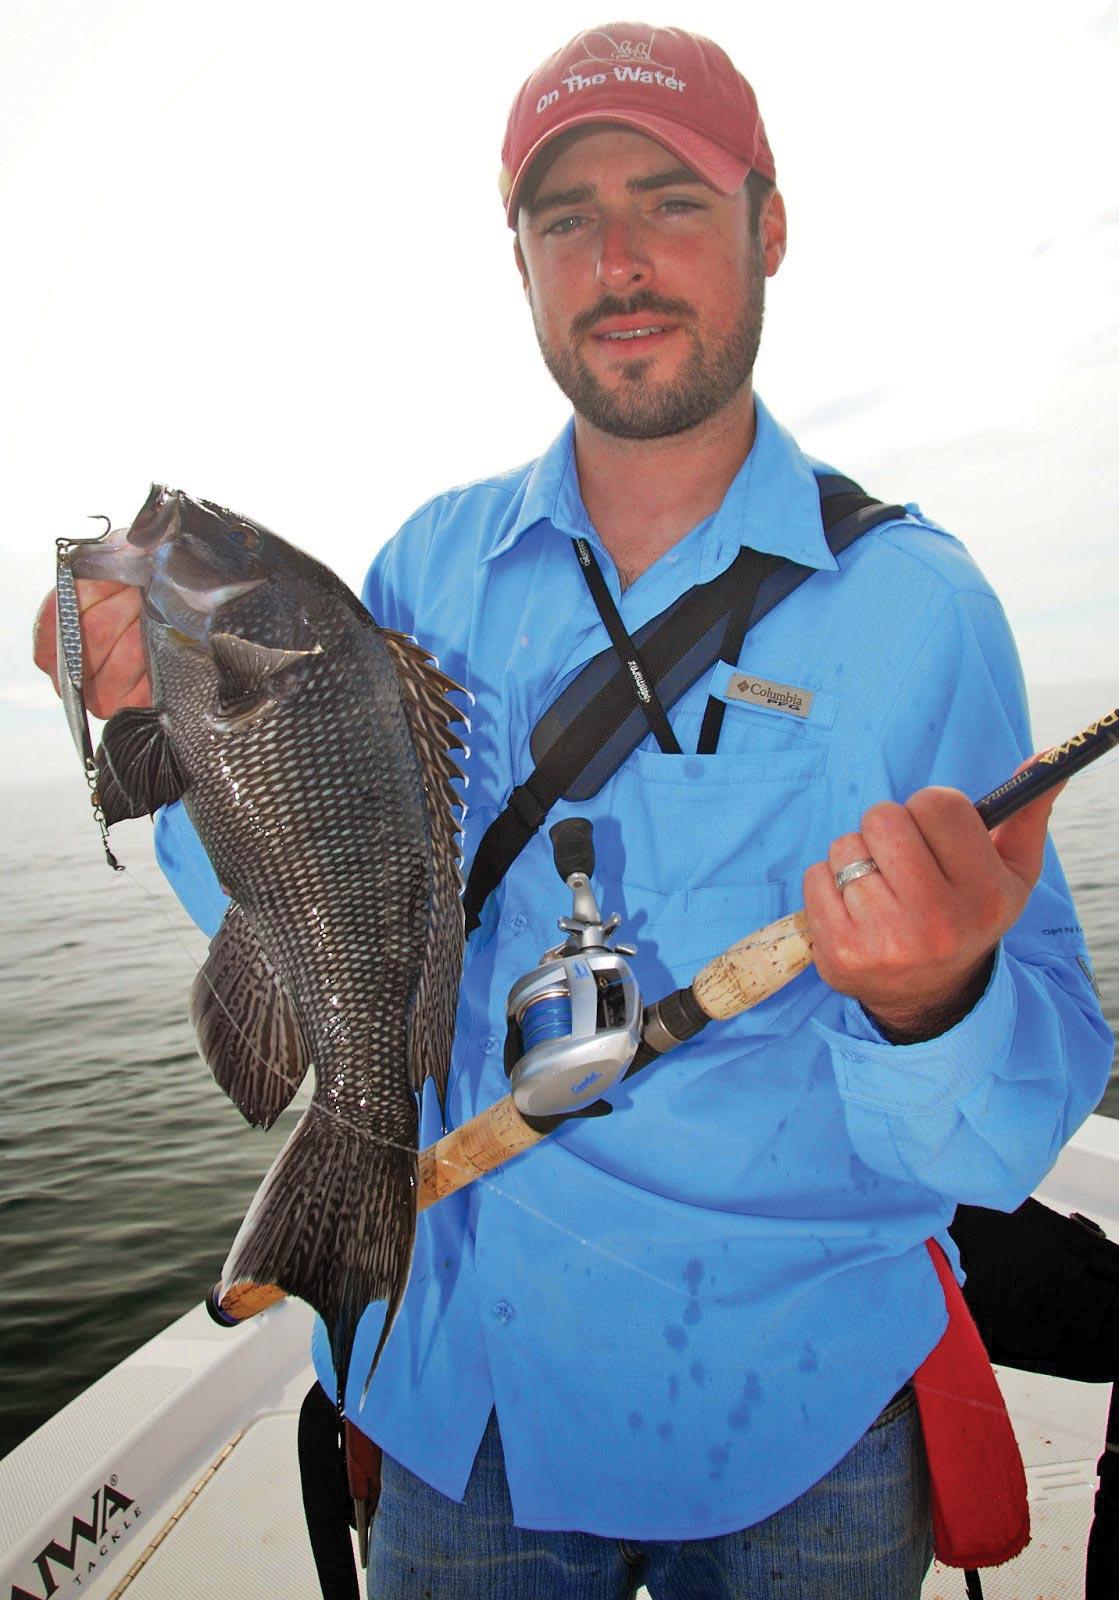 Diamond jigs are an effective tool for sea bass